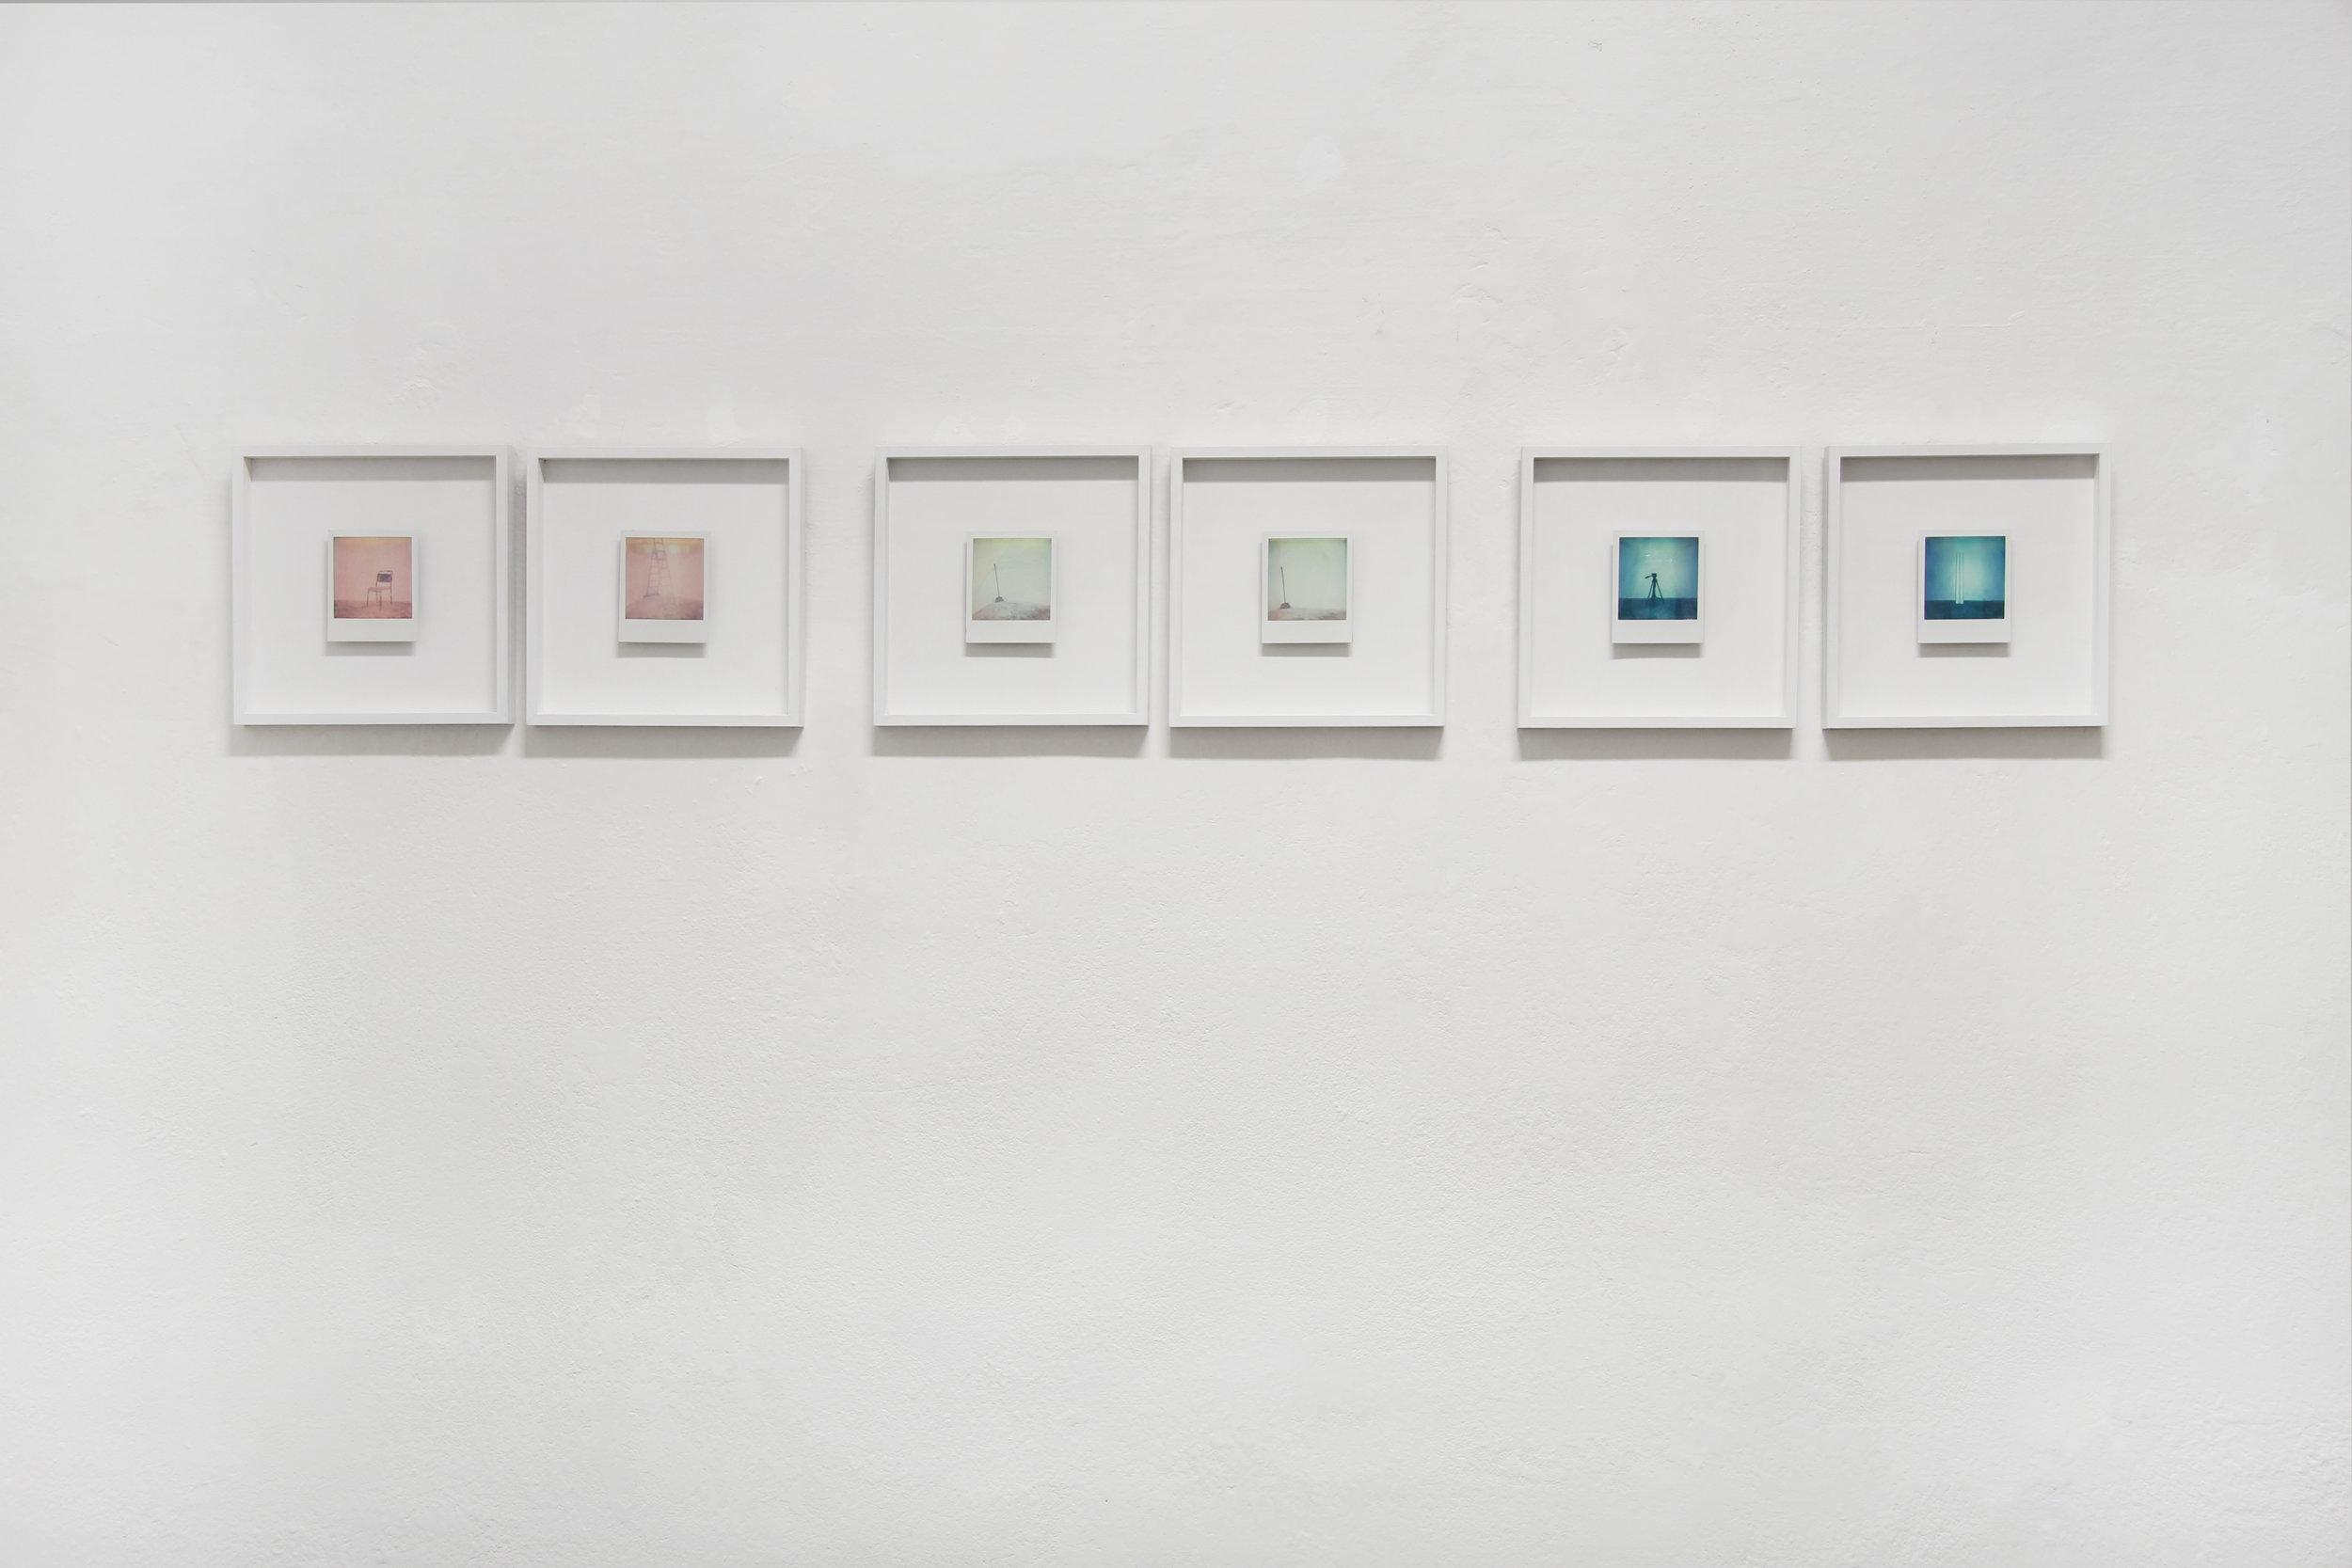 10. Irene Fenara, %22Studio%22, 2013, Polaroid, cm 25 x 25.JPG